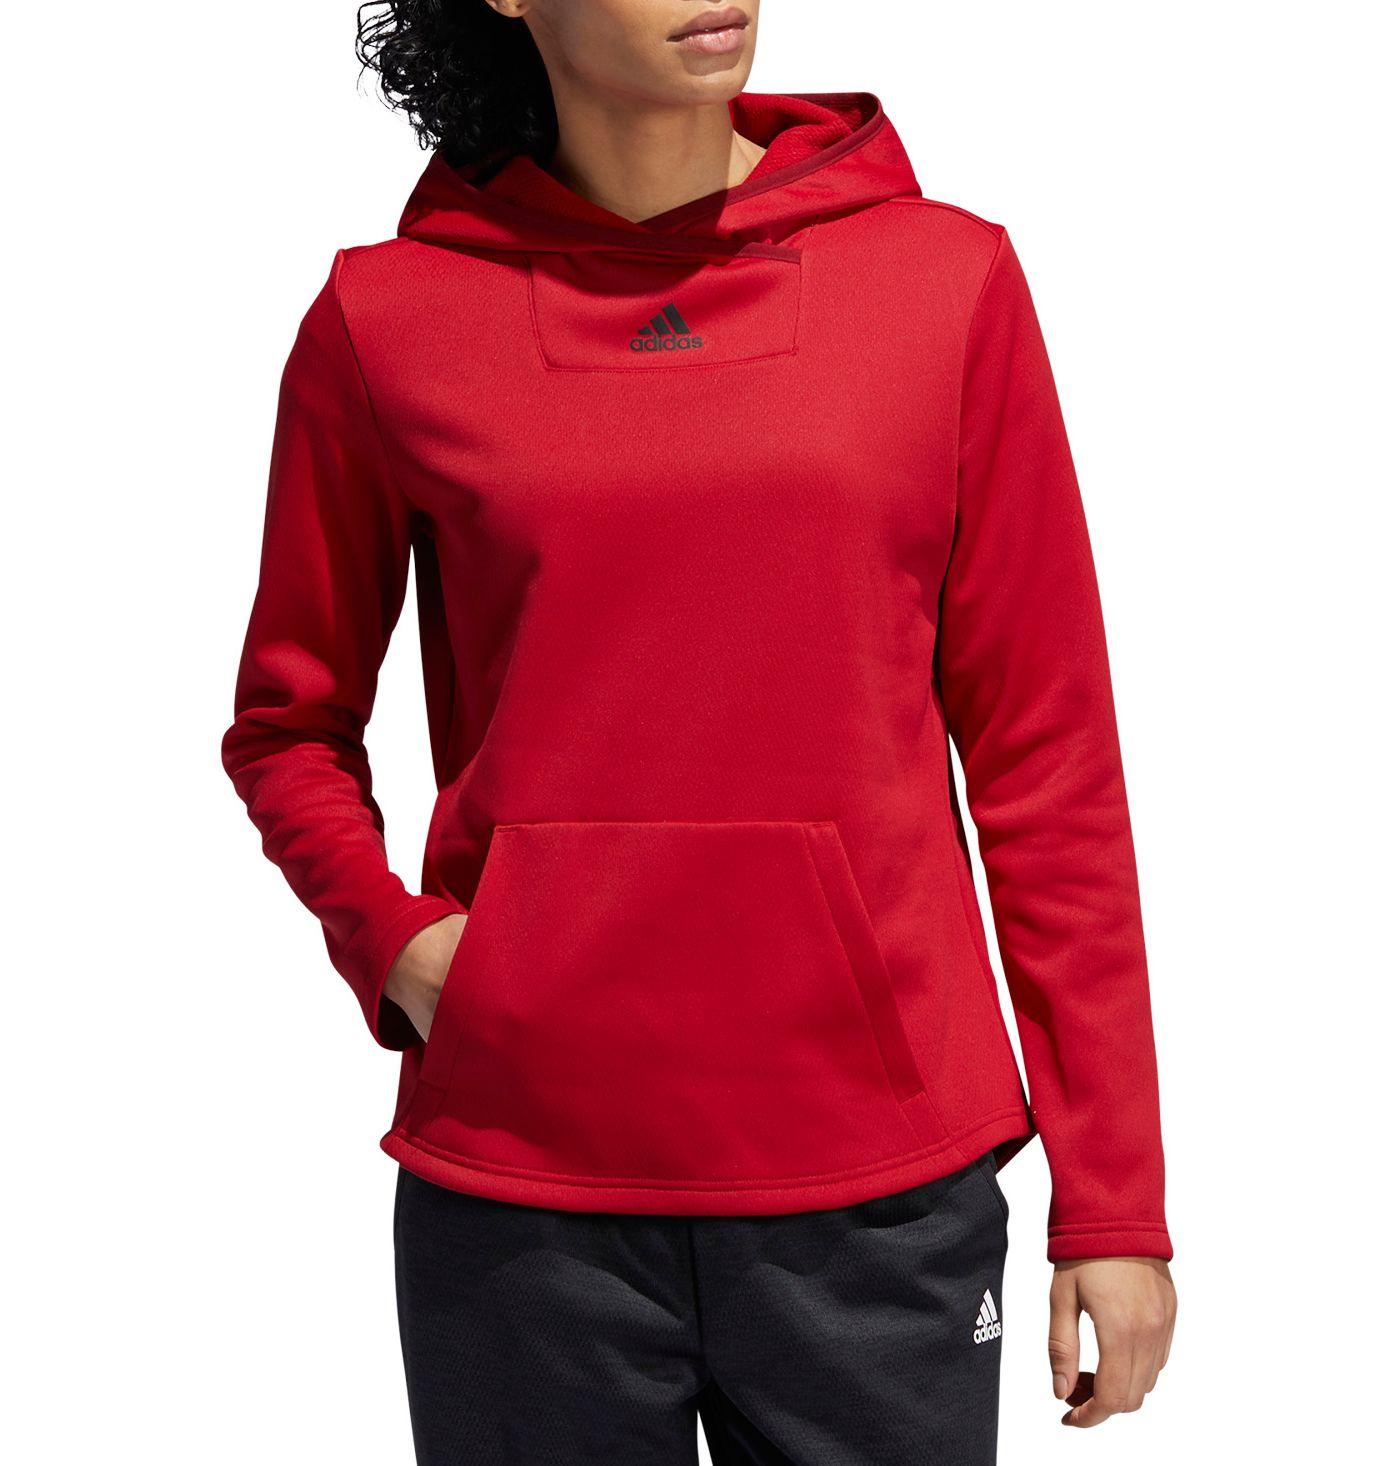 adidas Women's Team Issue Pullover Hoodie